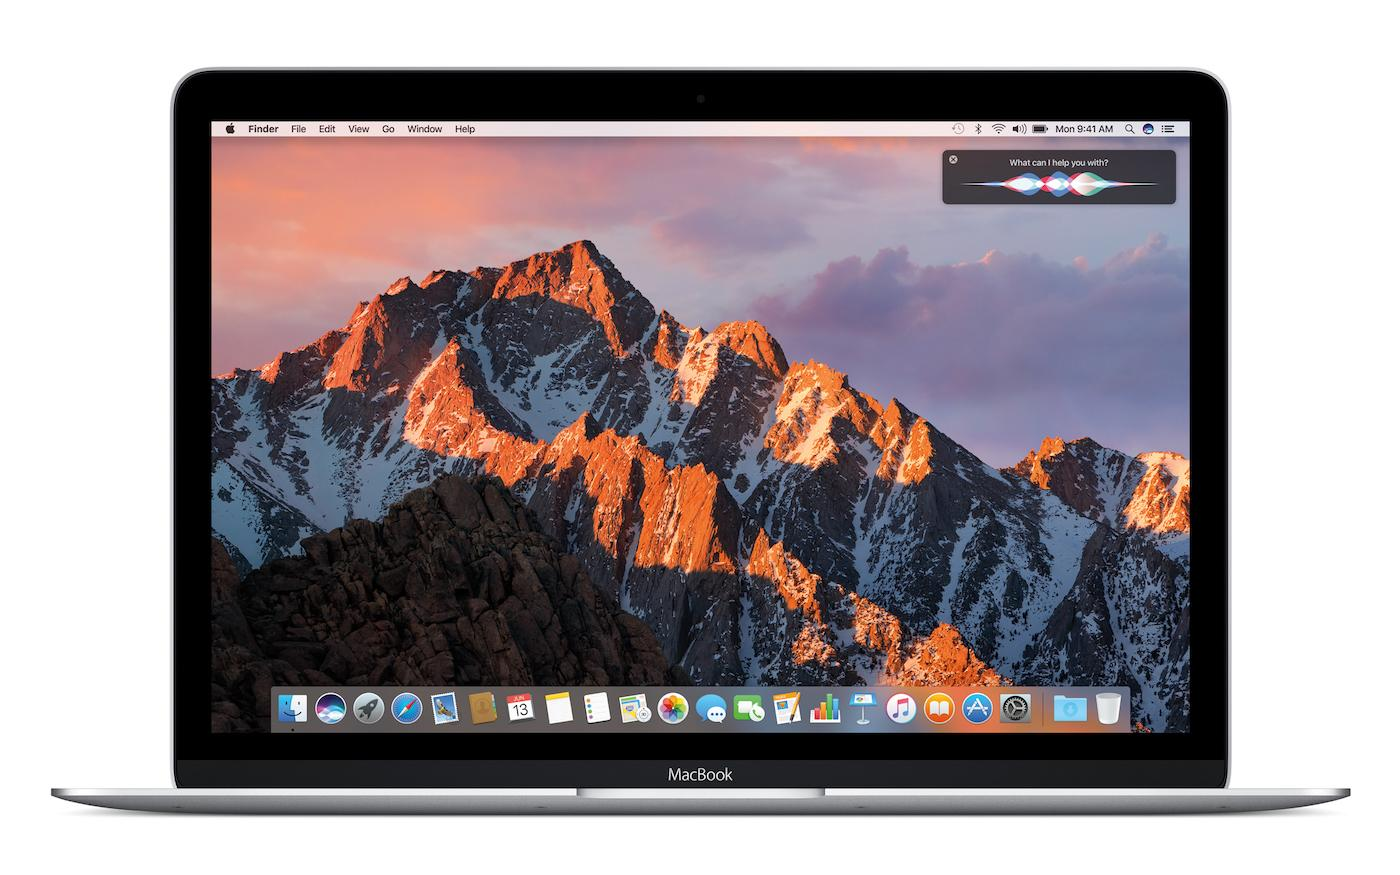 MacBook AirやiMacにも新モデルのうわさ。5KディスプレイはLGと協力、iPadはPencil対応を拡大へ - Engadget 日本版